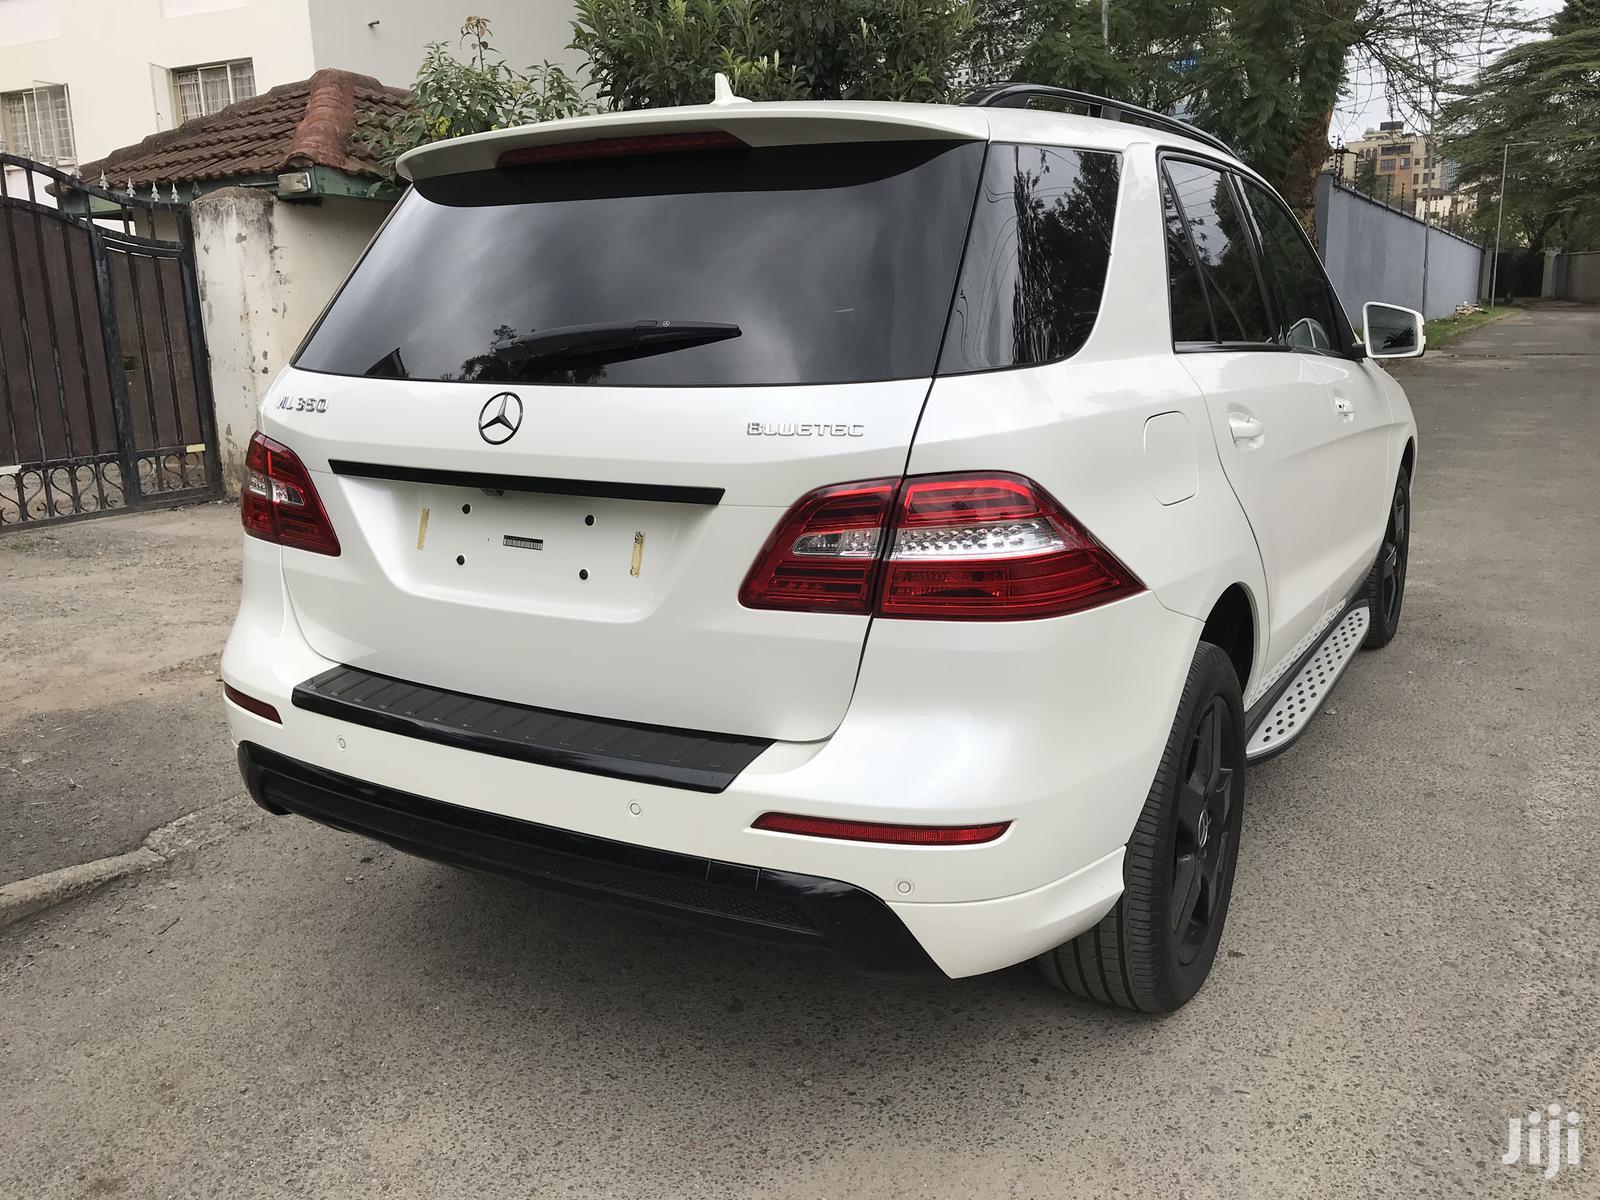 Mercedes-Benz M Class 2013 White   Cars for sale in Kilimani, Nairobi, Kenya